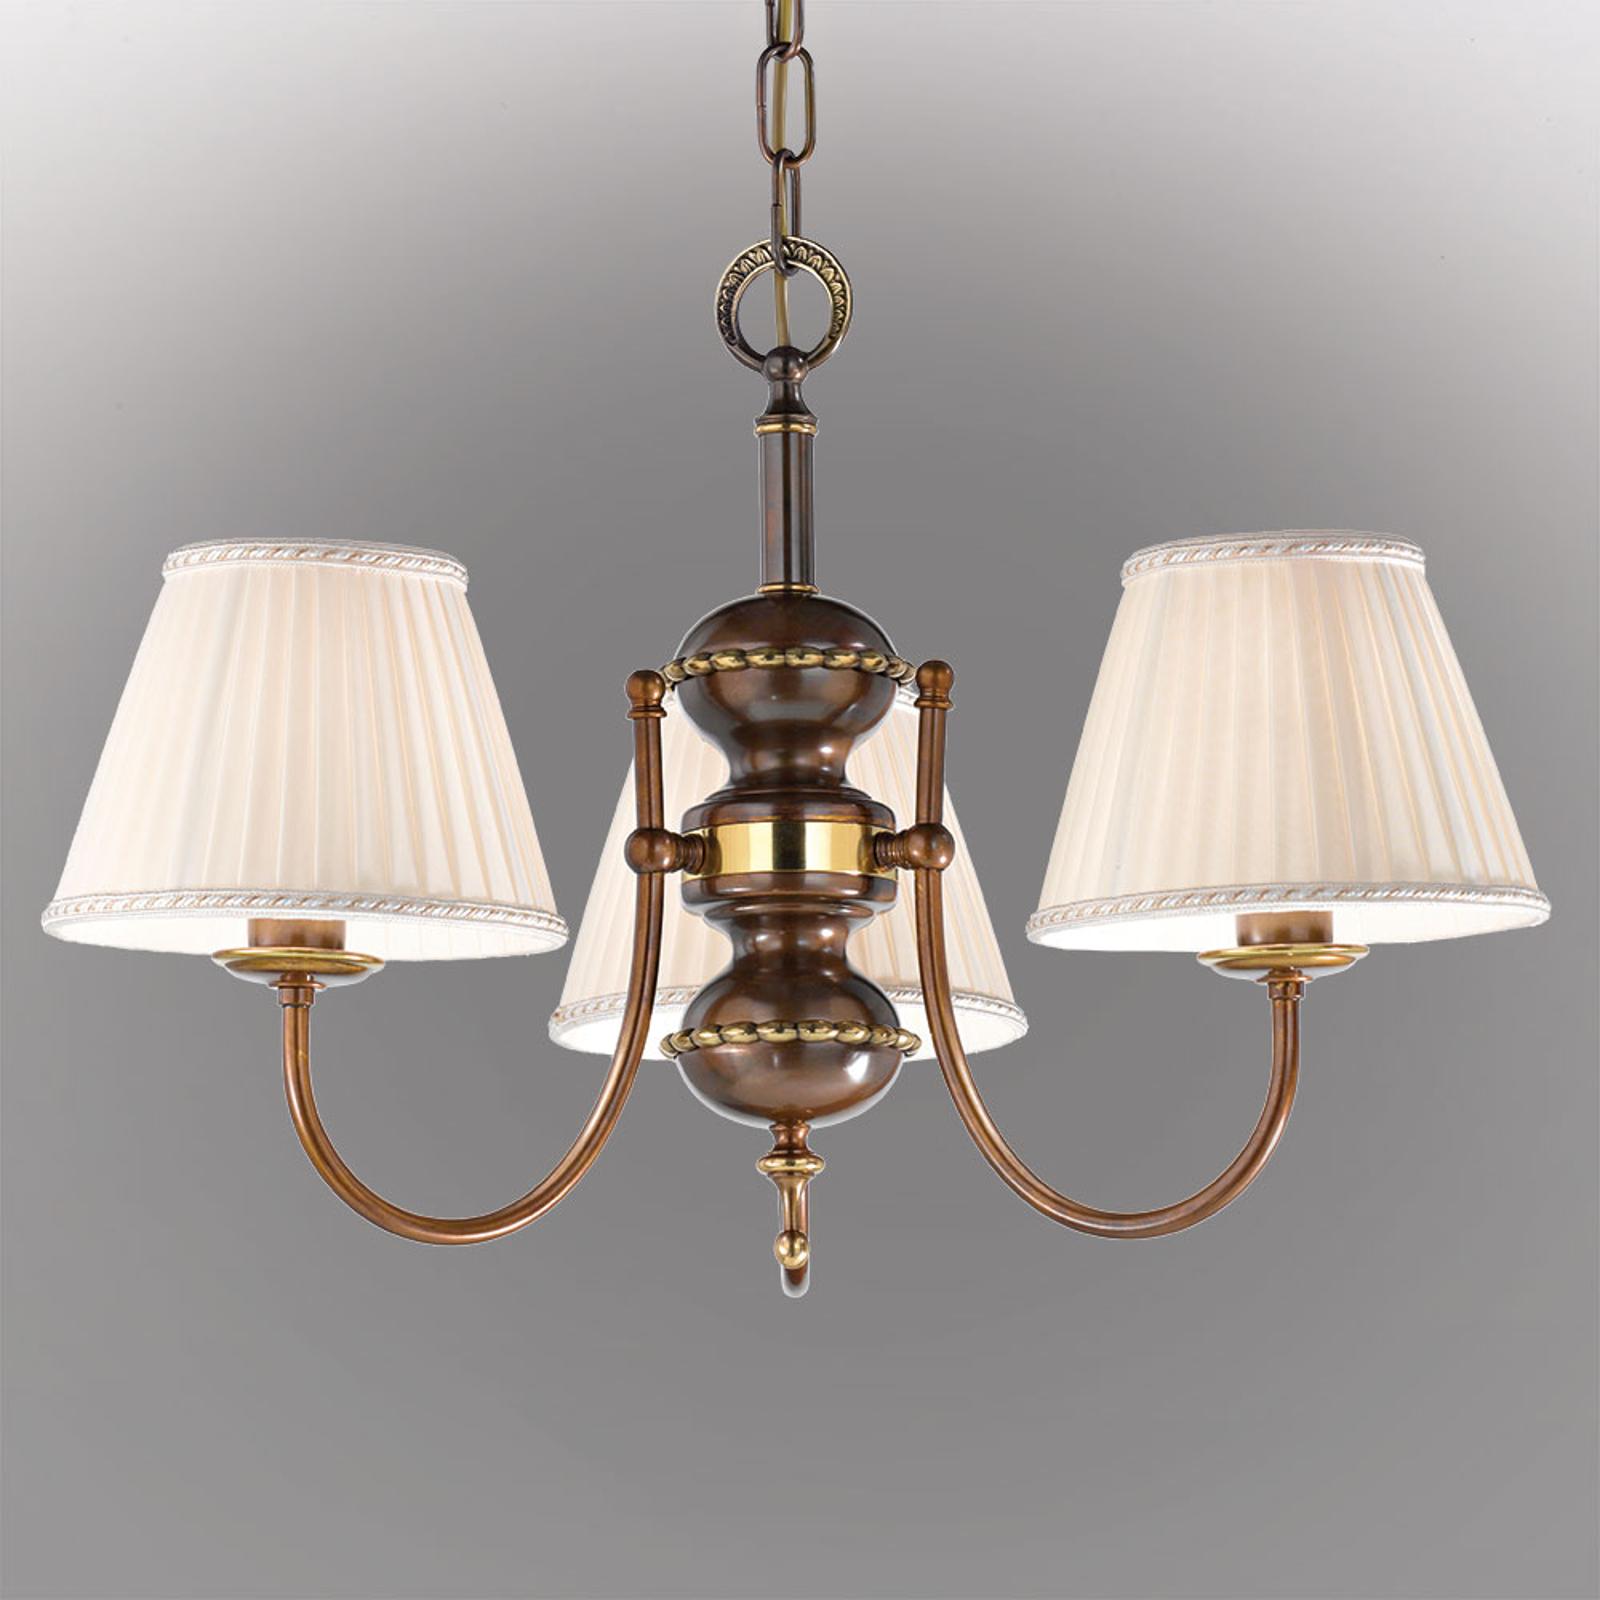 Suspension Classic antique à 3 lampes